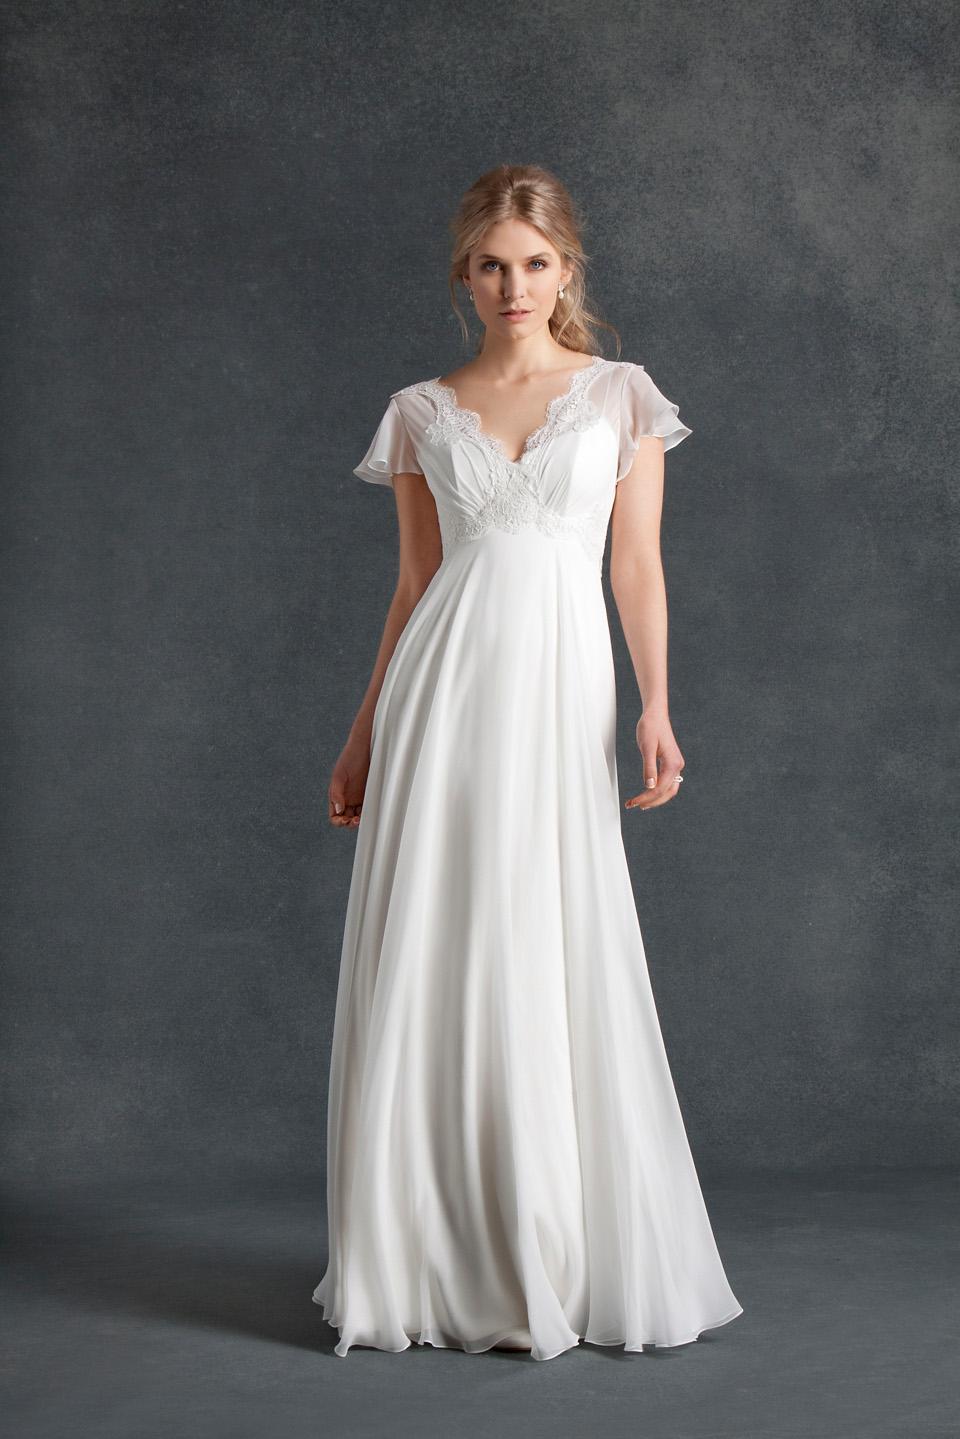 083bdf939d804 wpid Emma Hunt London Bridal Collection - Emma Hunt London - Timeless  Simplicity for Brides,